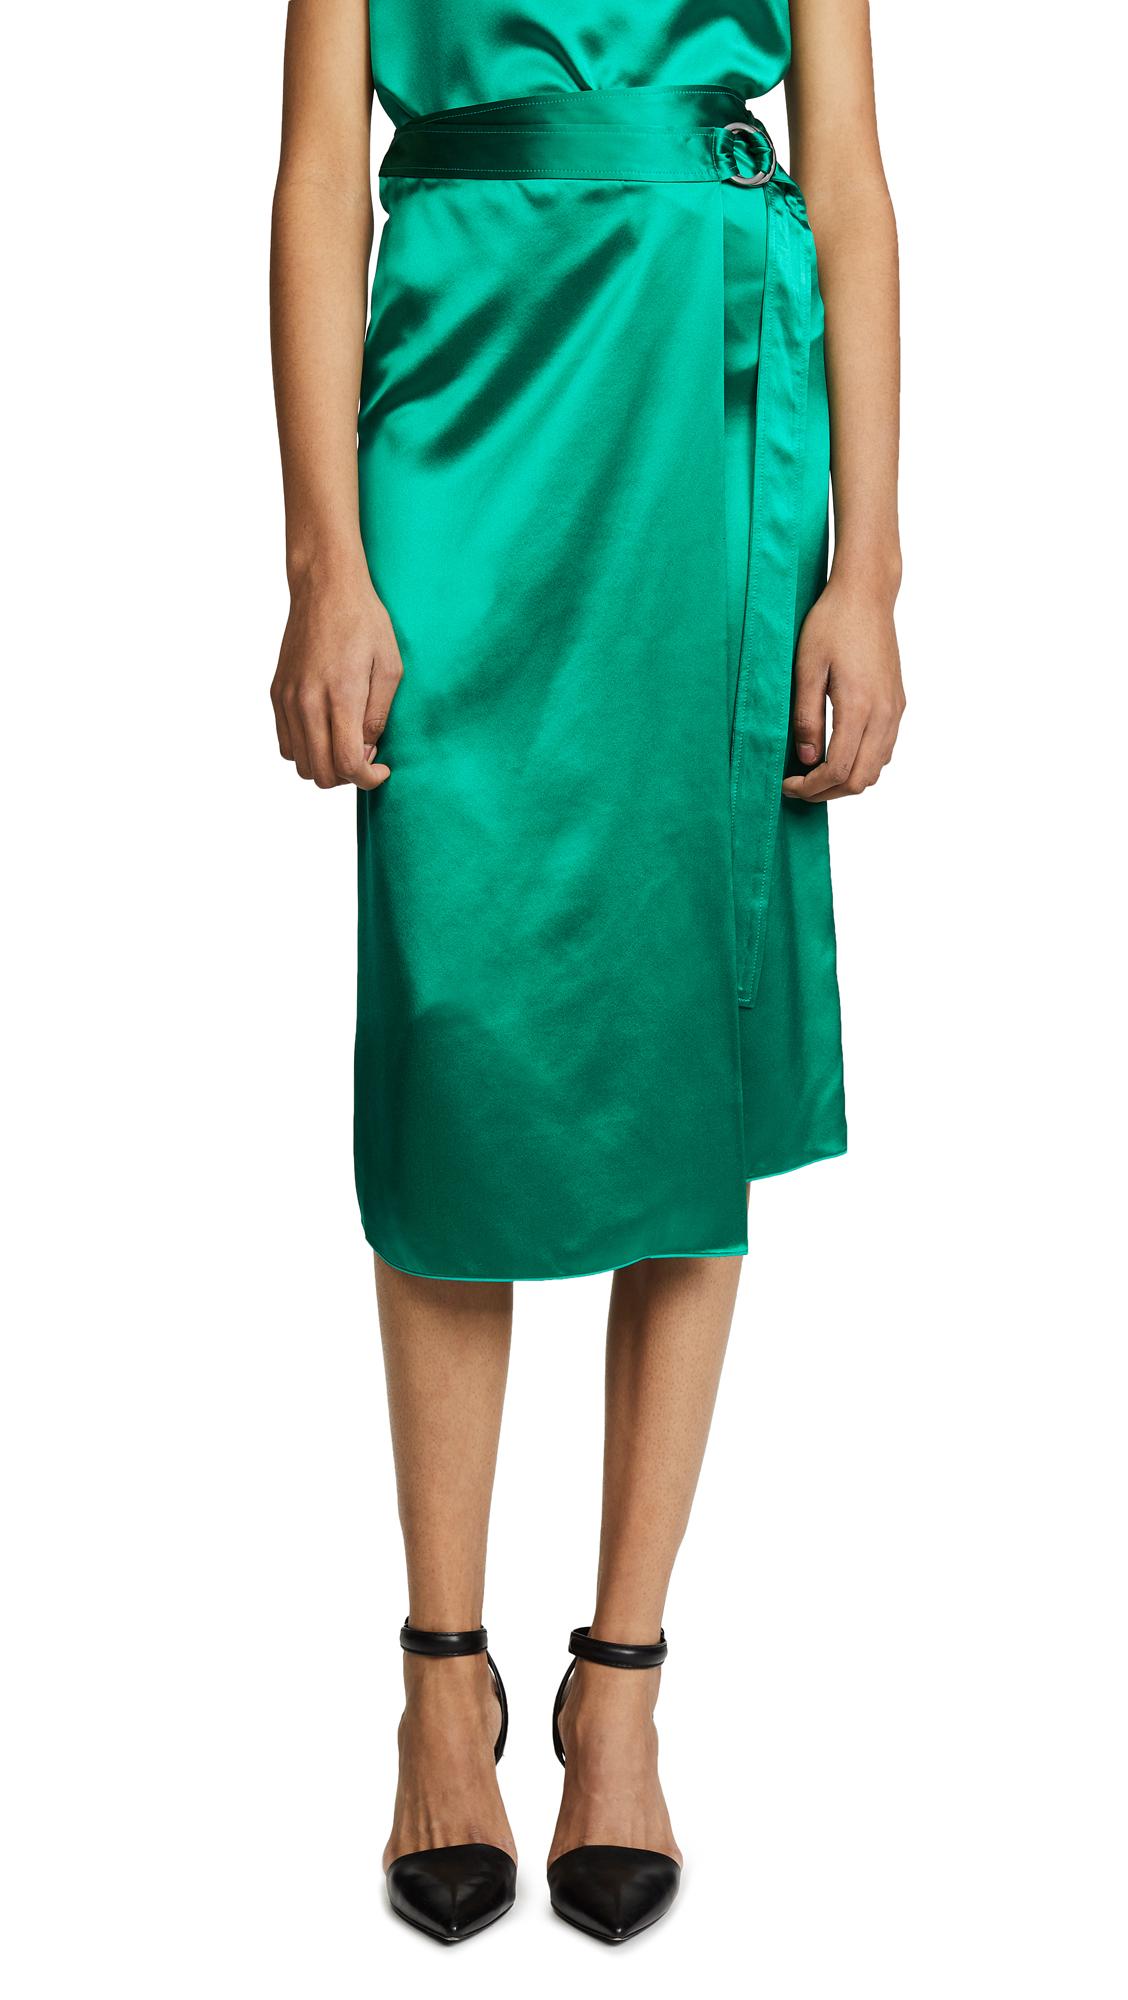 Dion Lee Silk Satin Tie Skirt - Primary Green